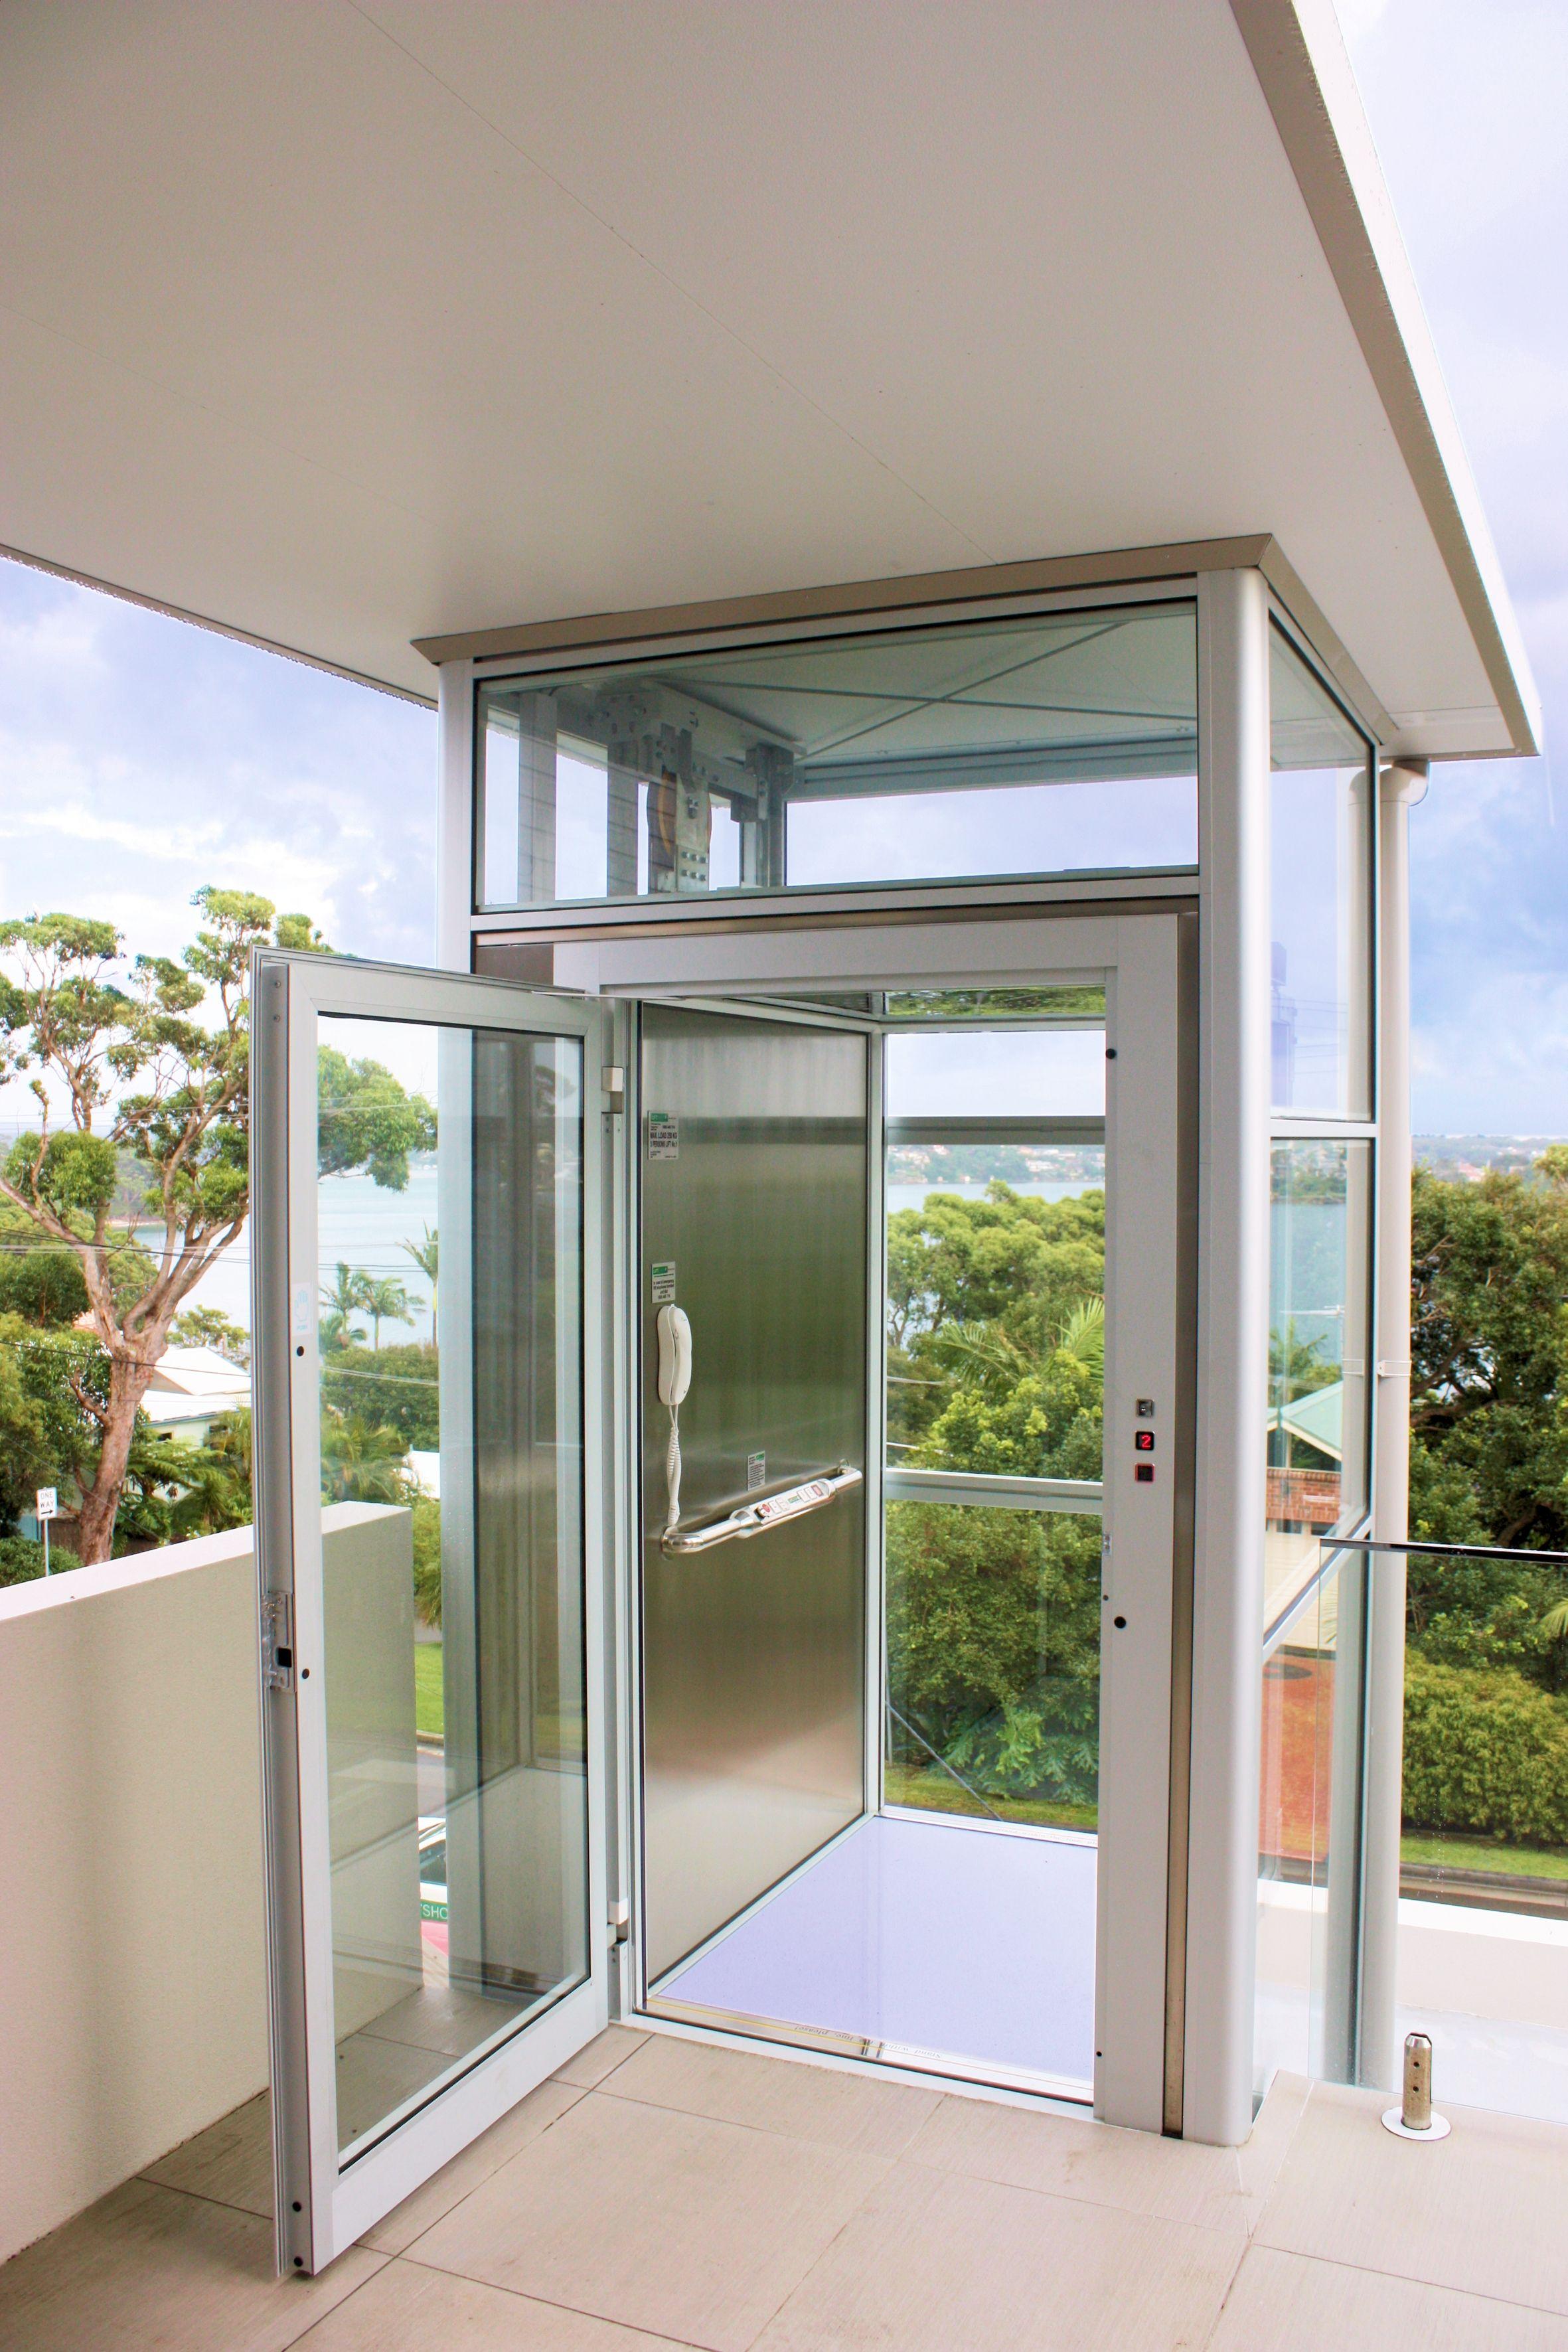 Elevator boutiques freedom lift model bundeena 2013 for Home elevators direct